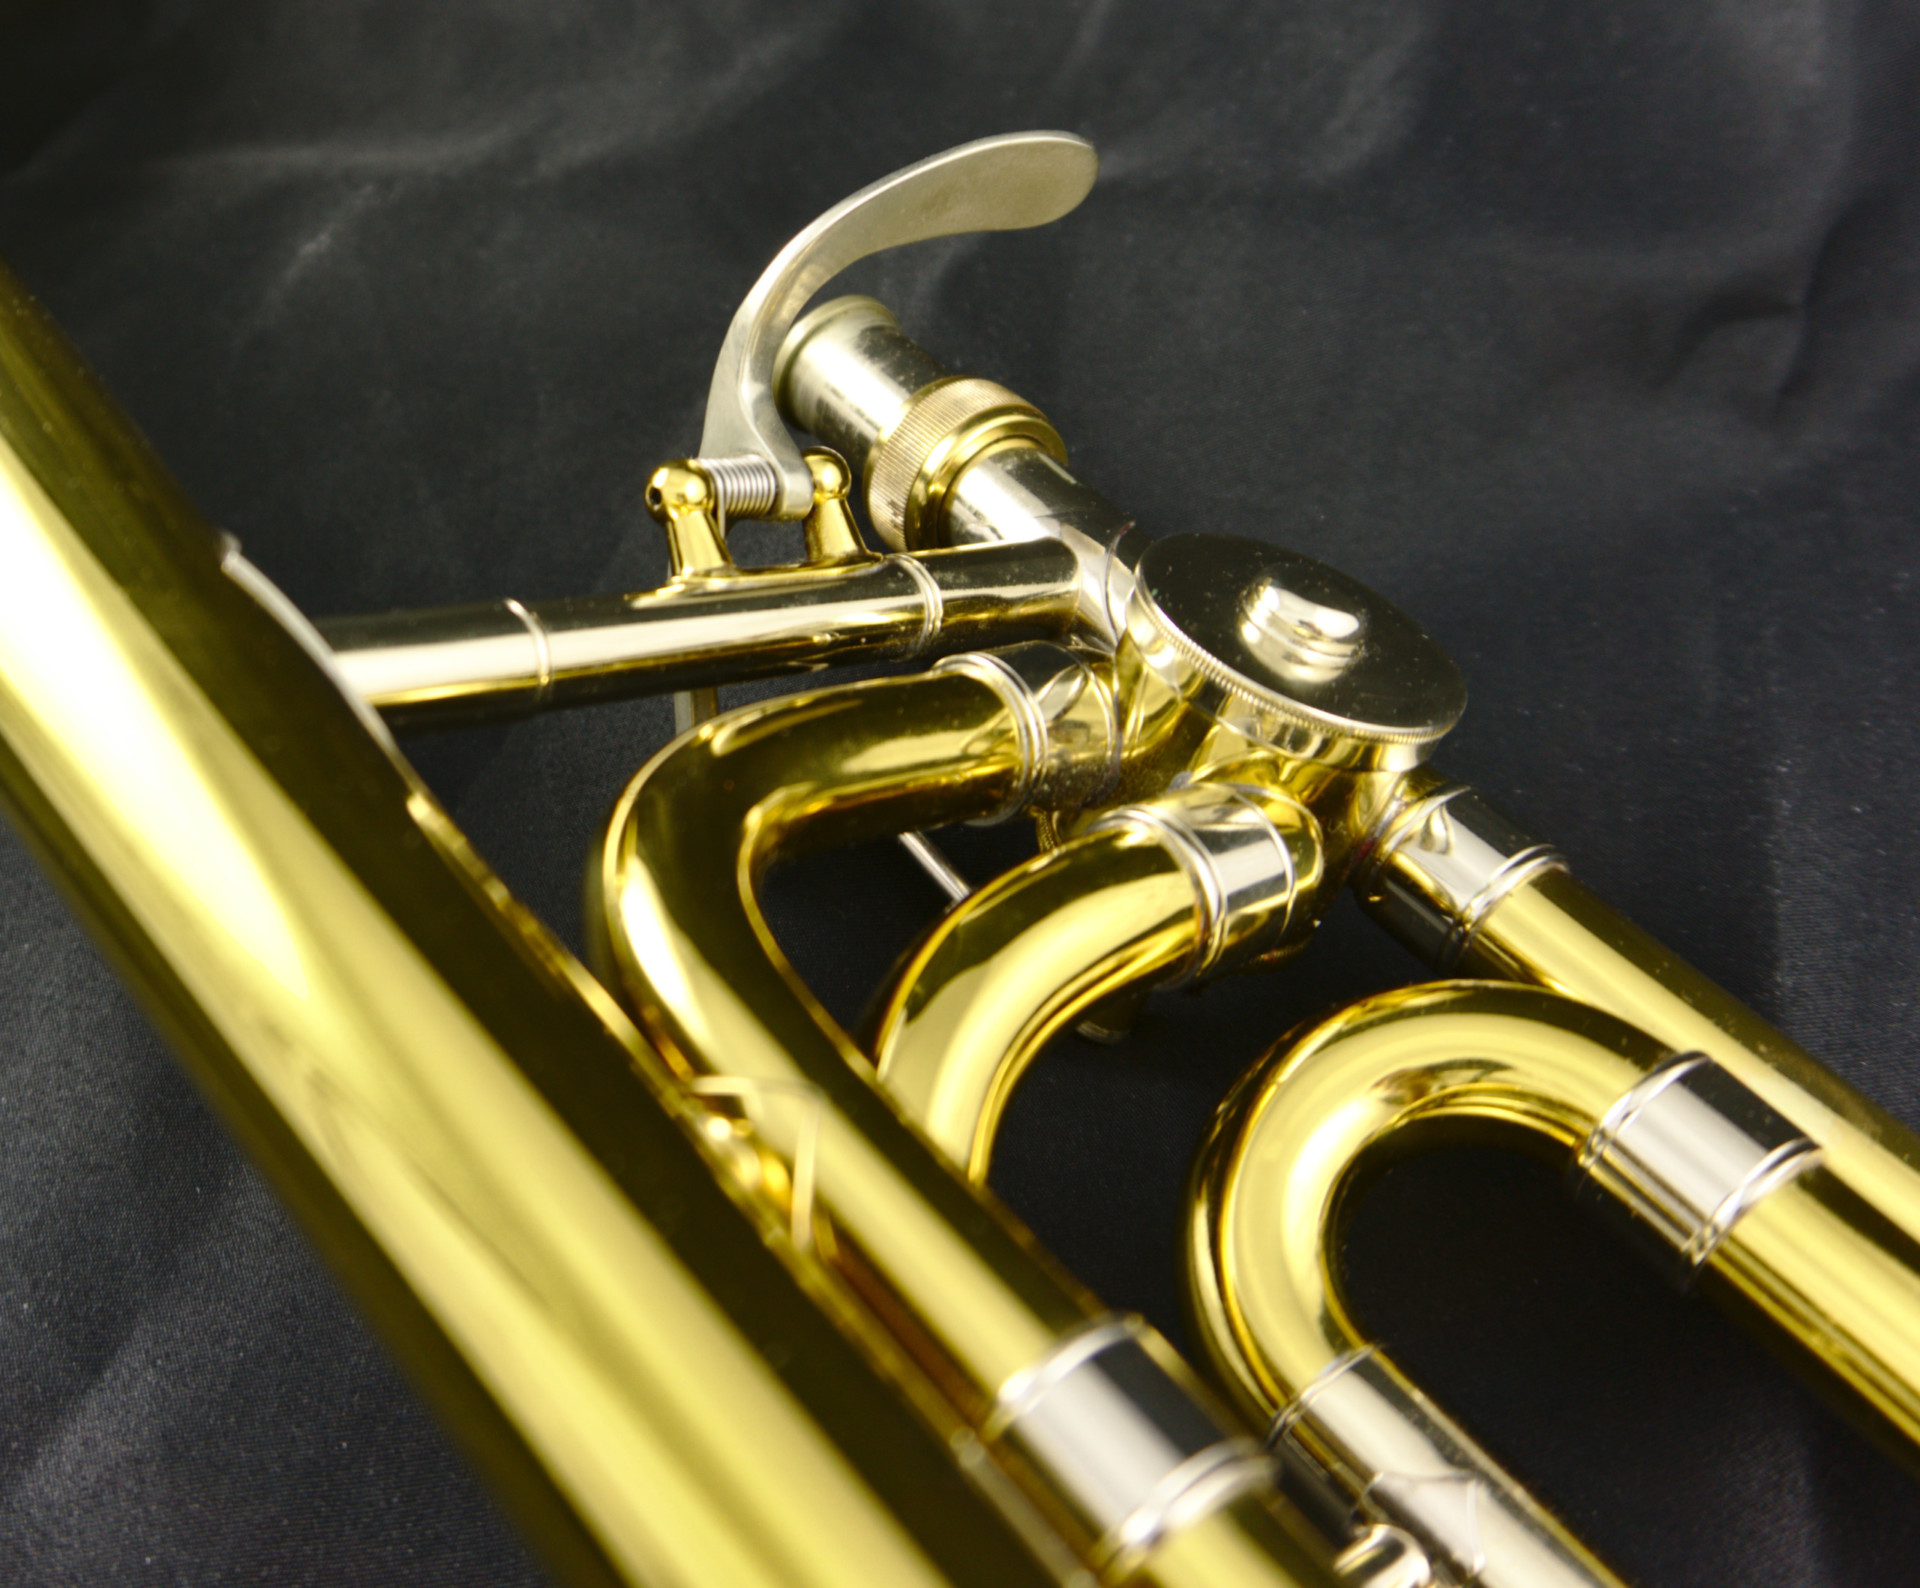 Bach 42b Corporation